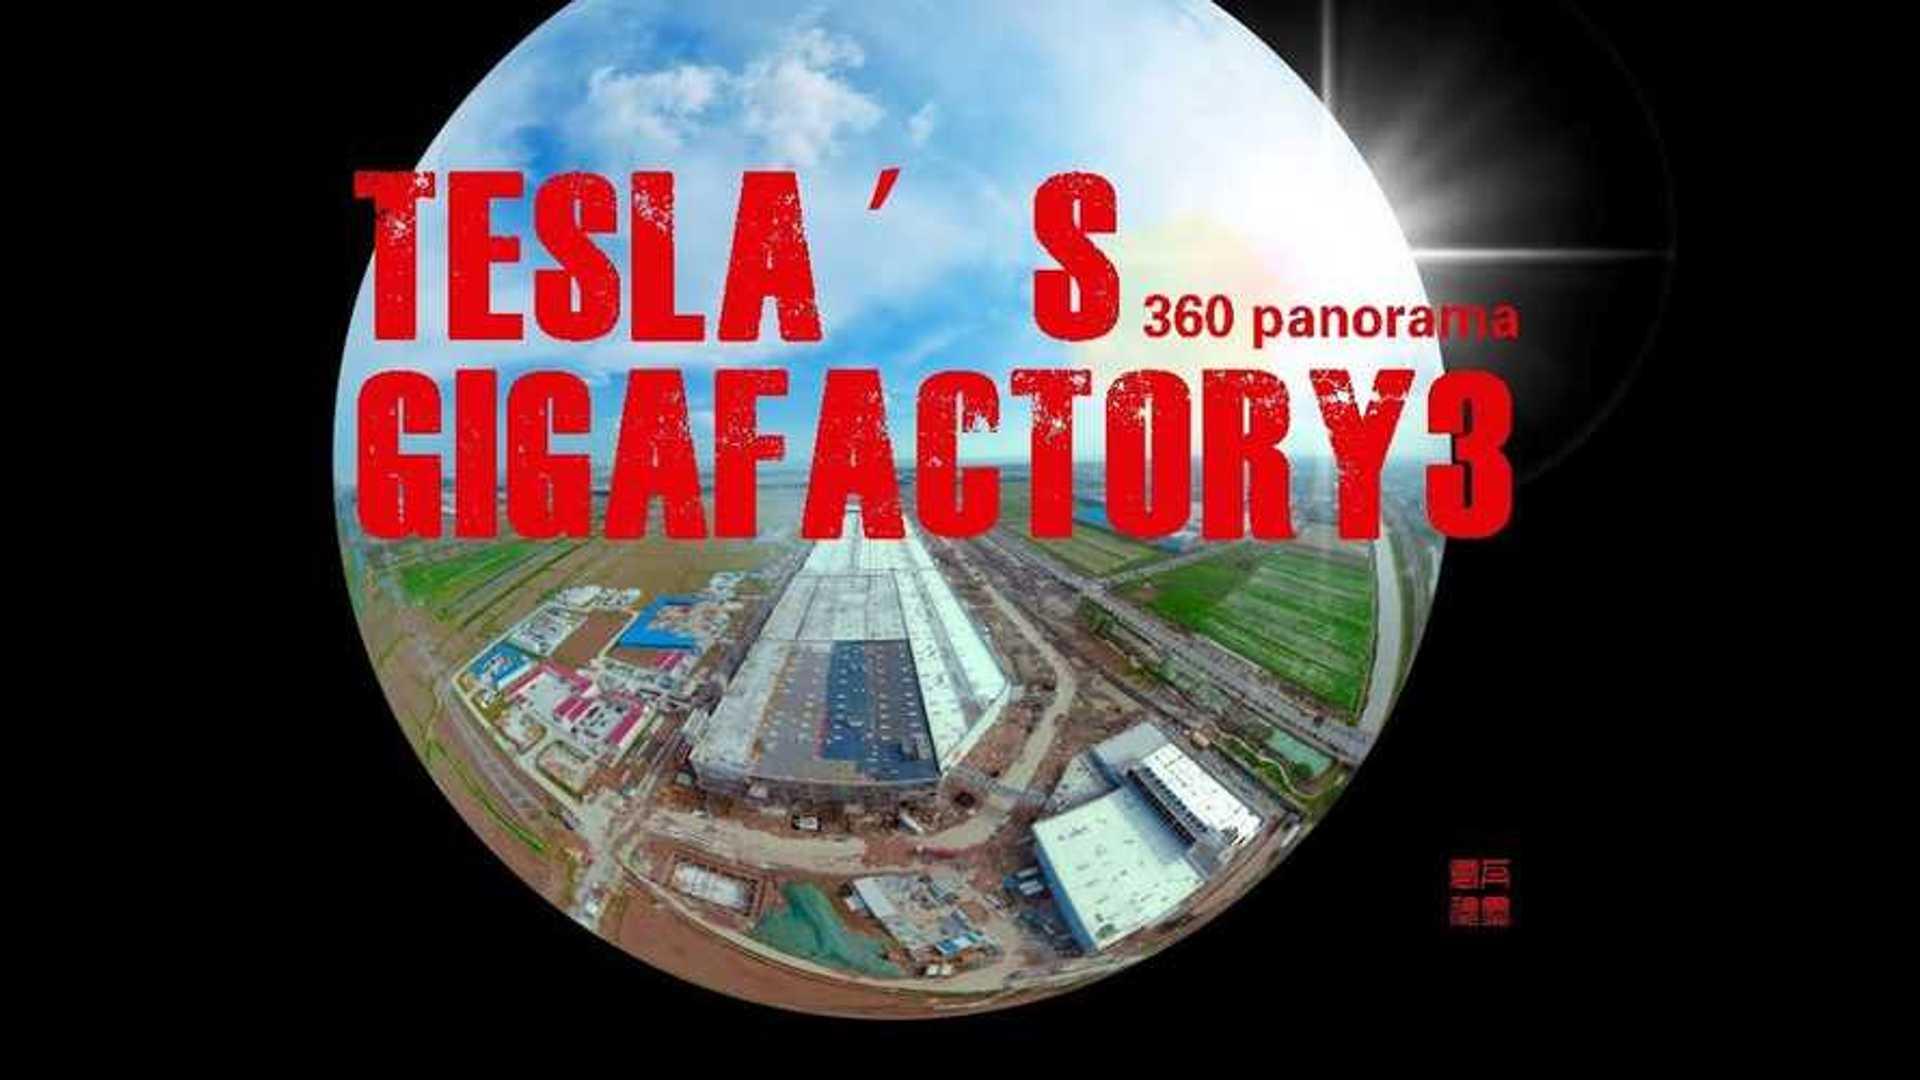 Tesla Gigafactory 3 Featured In Stunning Panoramic View